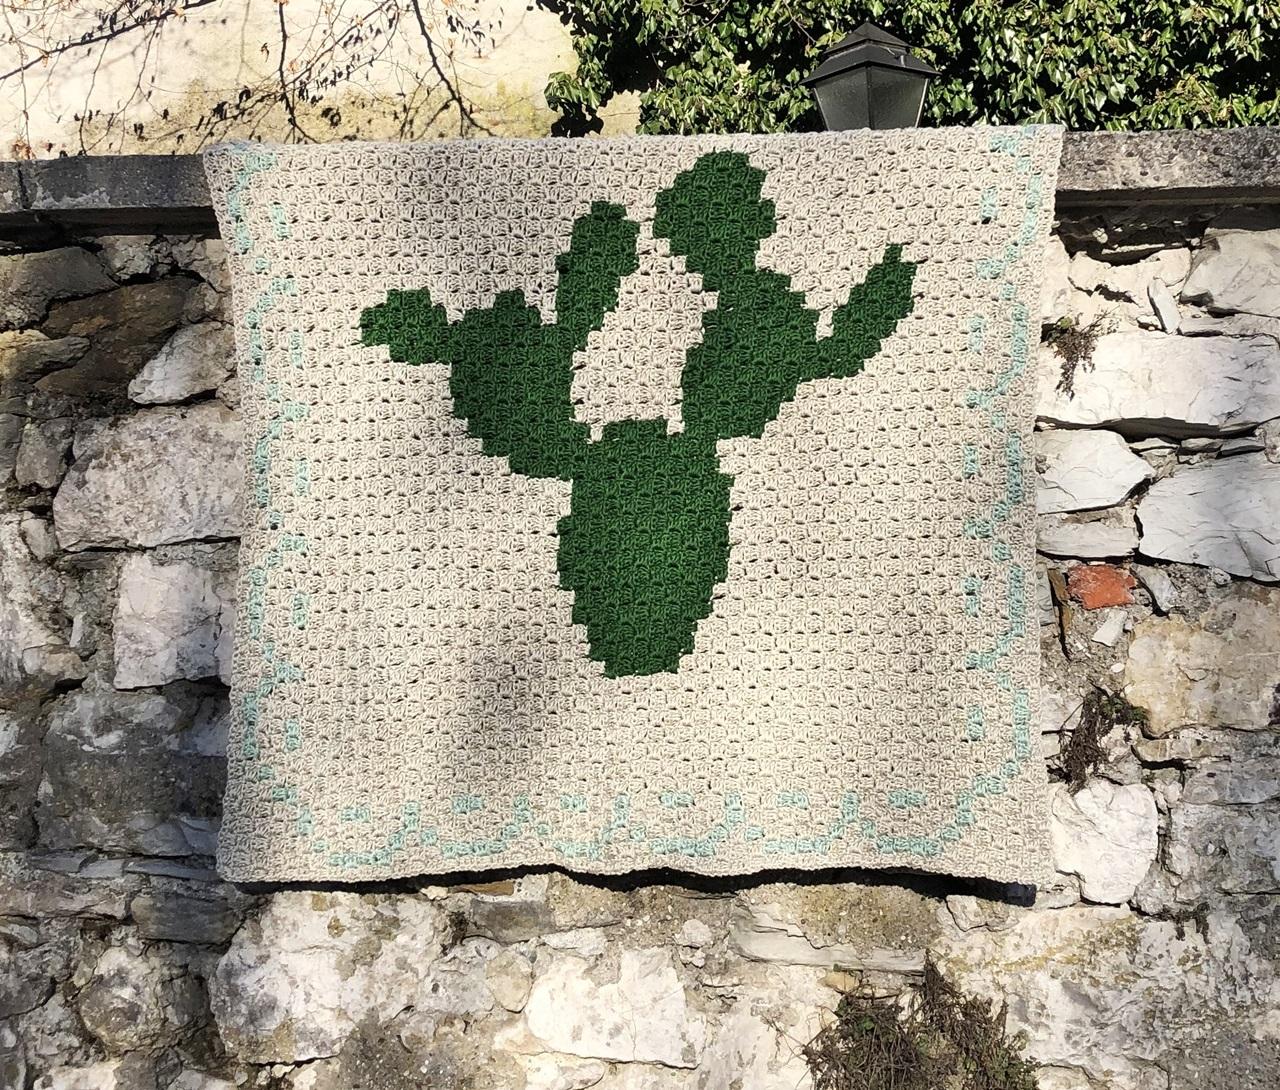 häkeln c2c anleitung Kaktus Decke